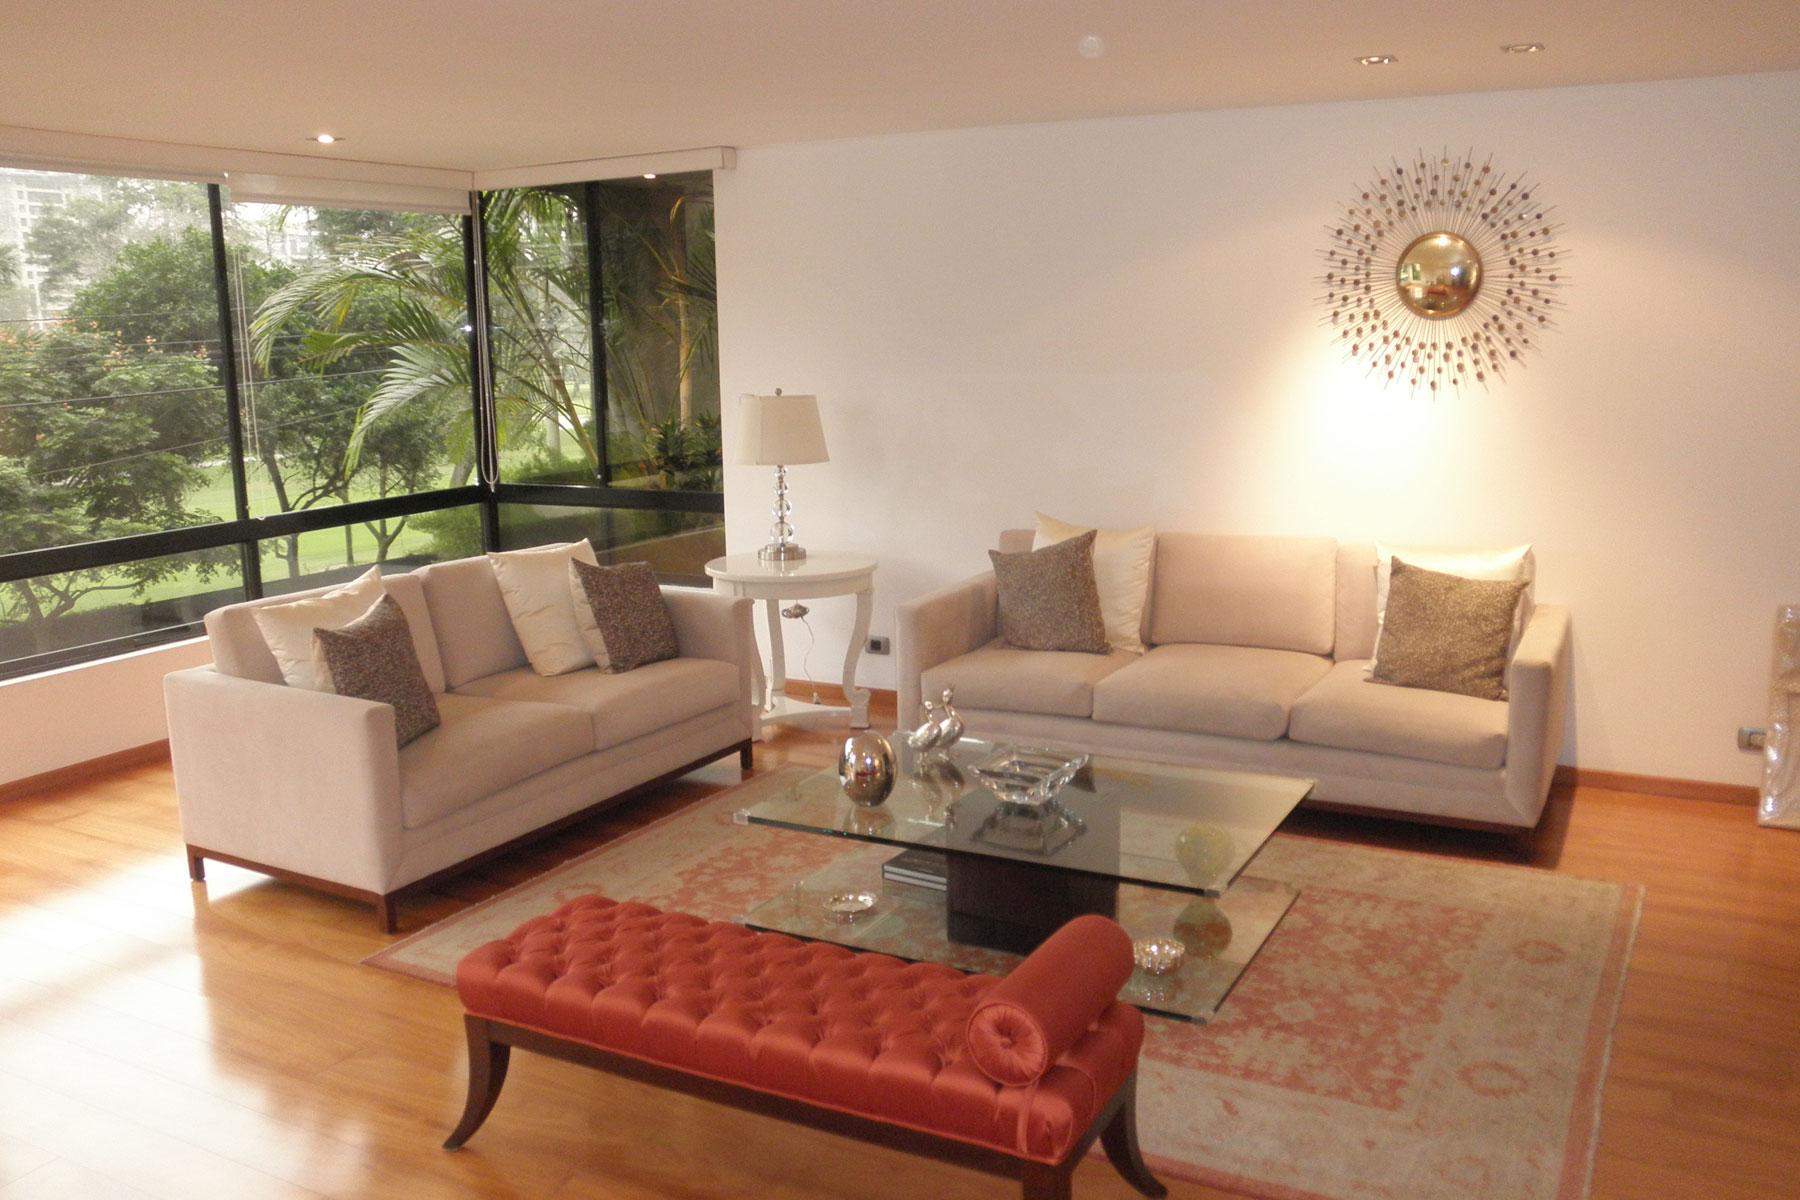 Appartamento per Vendita alle ore Hermoso flat con linda vista al Golf Av. Aurelio Miro Quesada San Isidro, Lima, 27 Peru